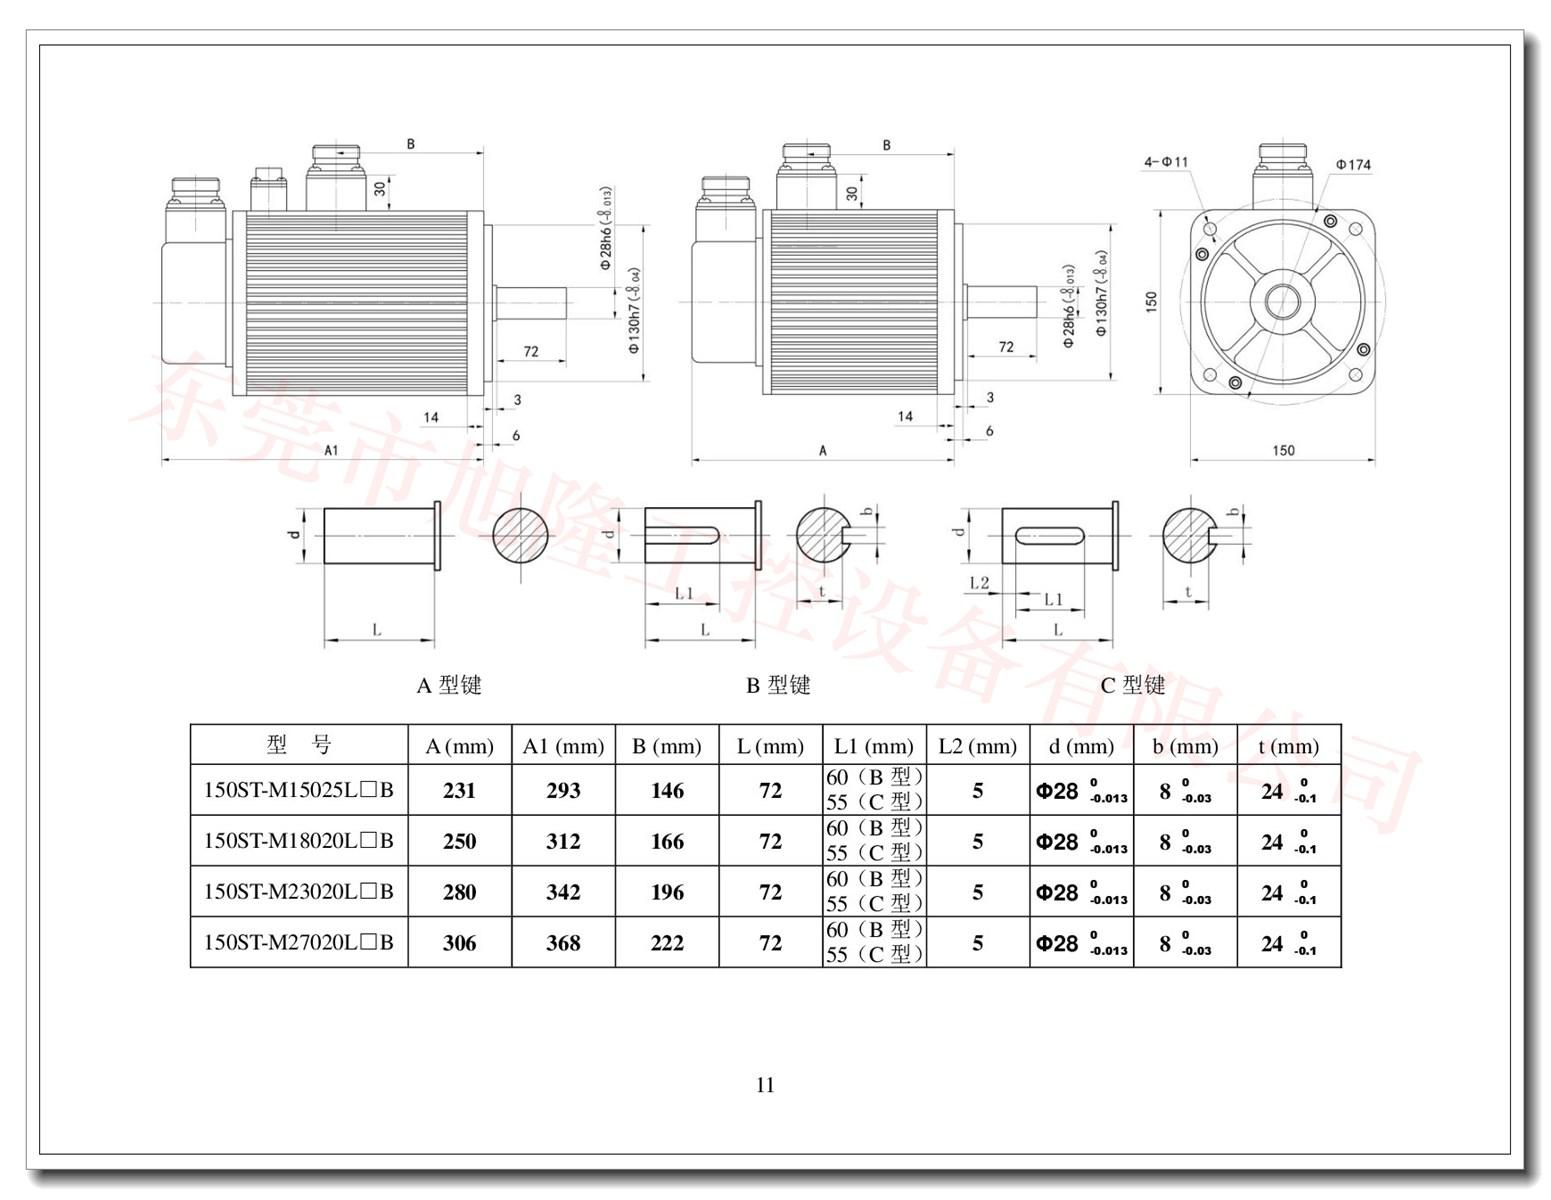 AC Servo Motor 220v 3.8-5.5kw 15Nm-27Nm 150ST Flange, AC ... on